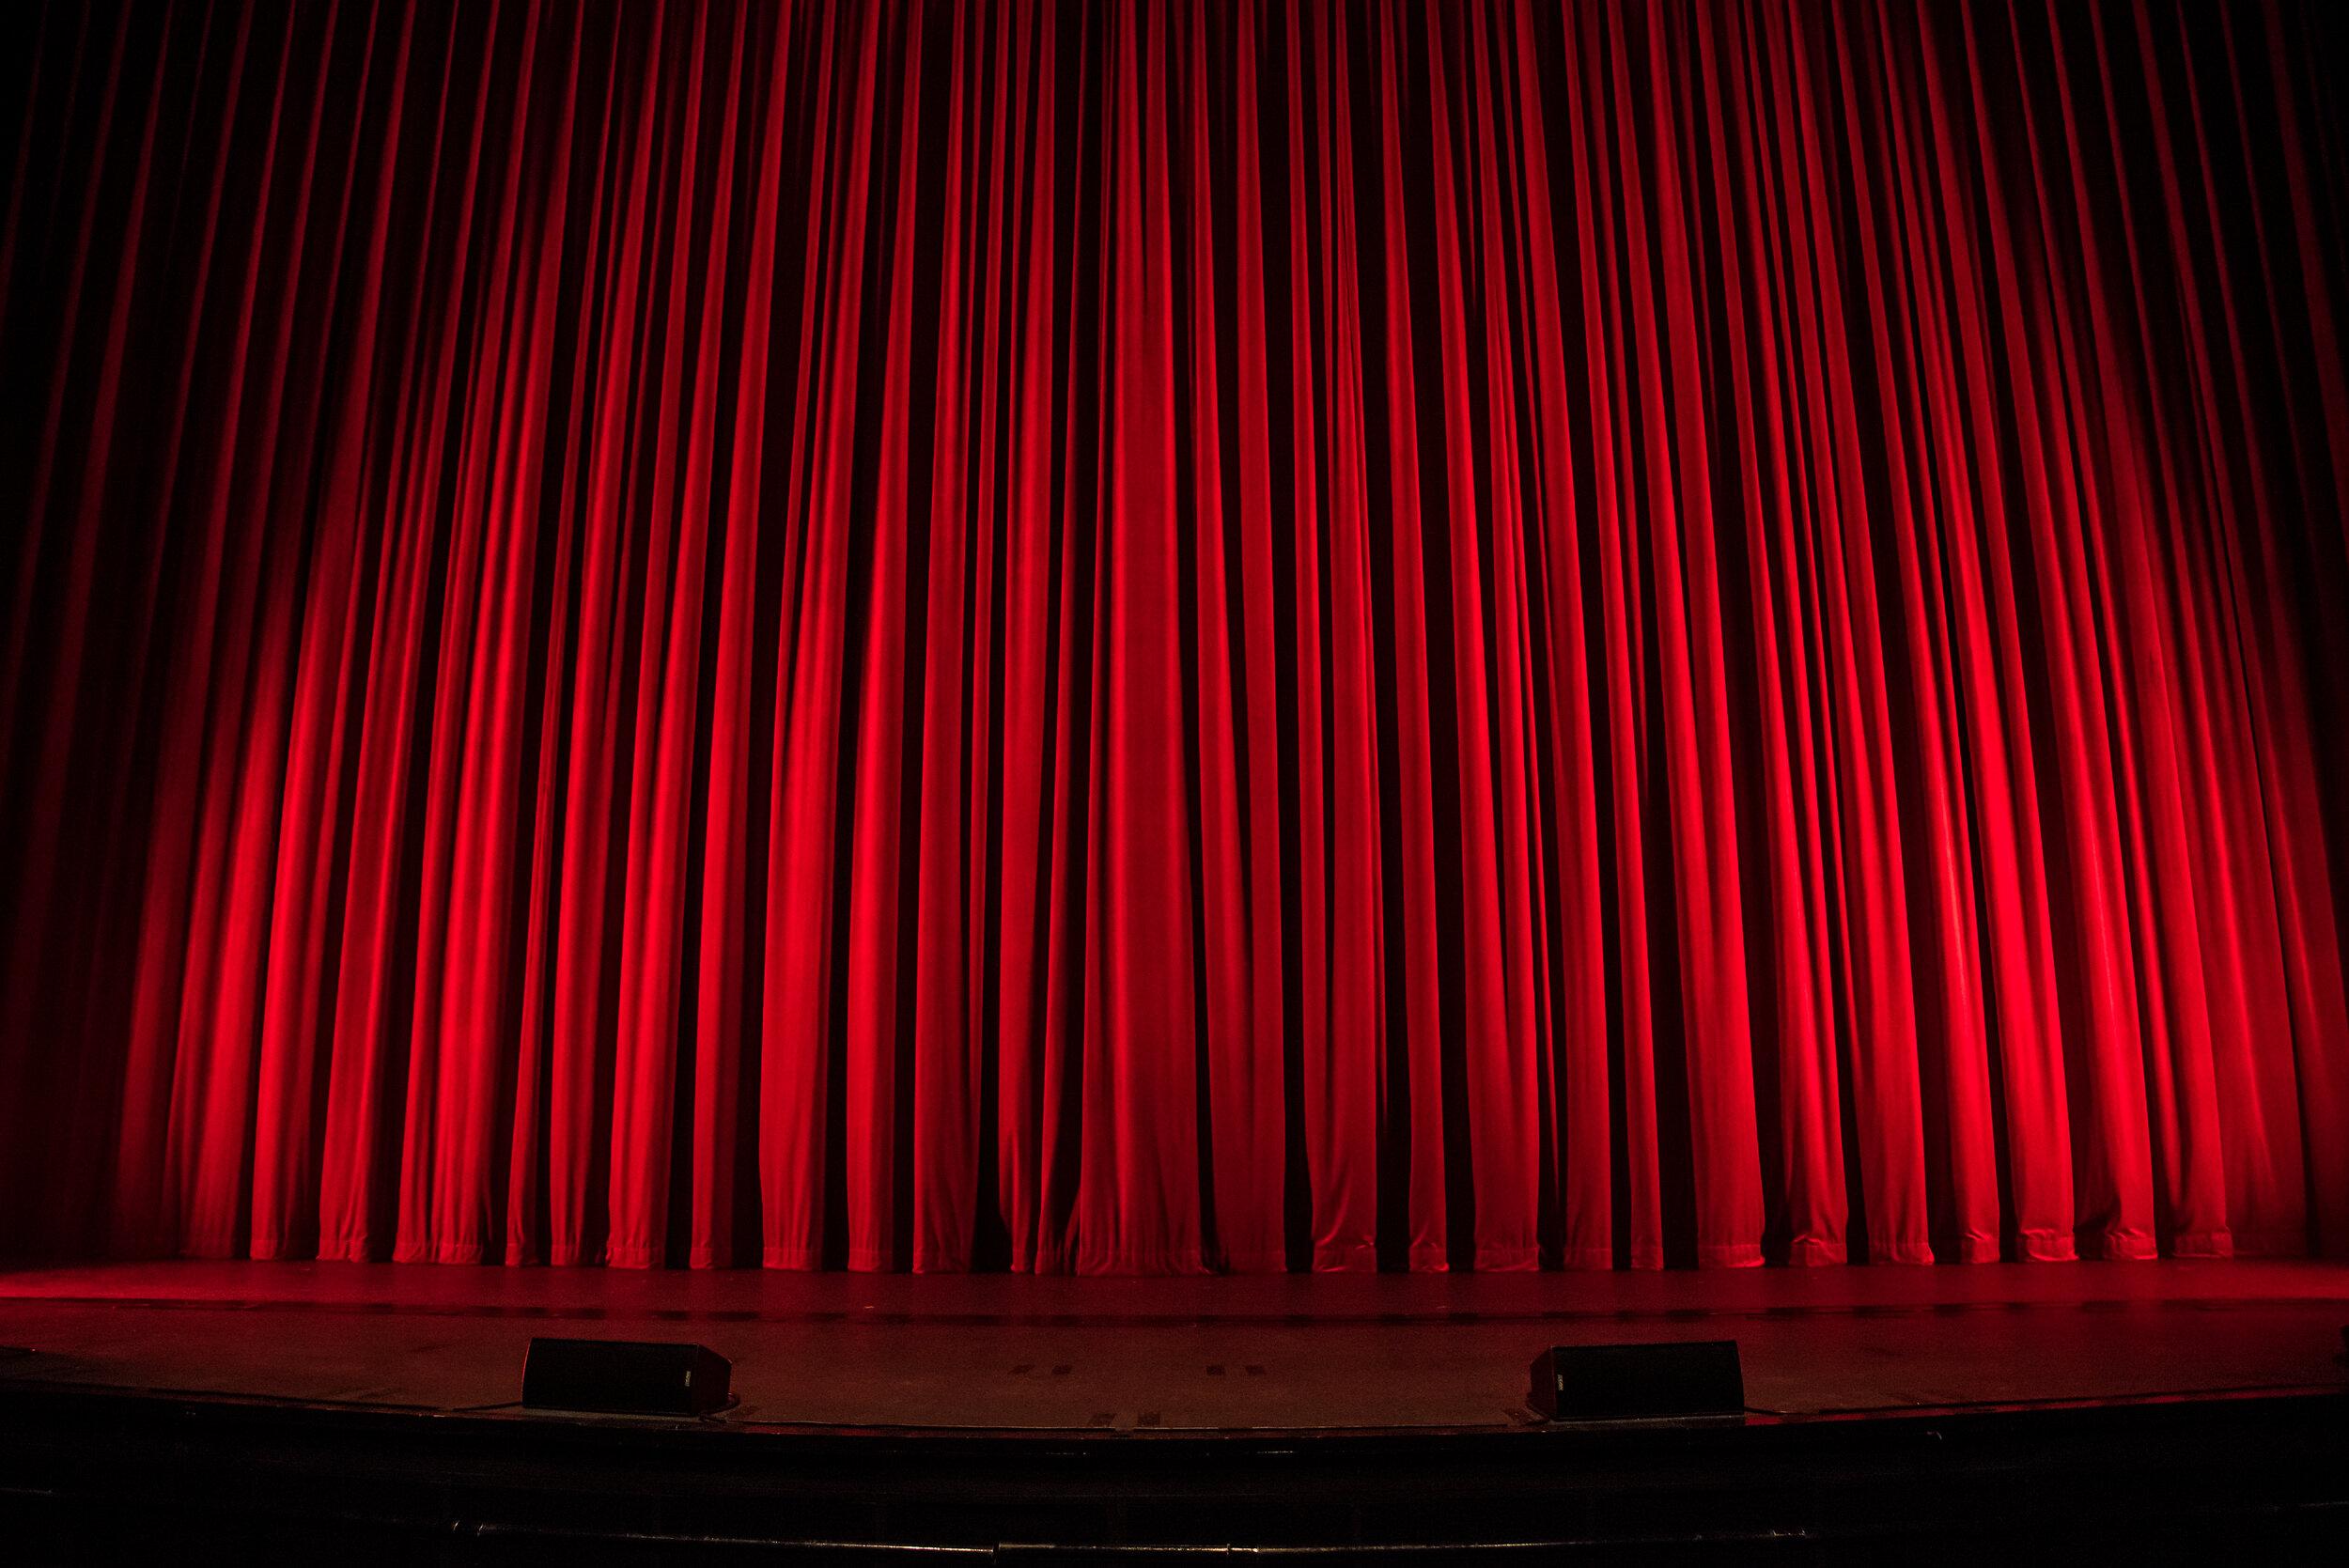 Willow Glen High School Theatre Sunday 11/3 11AM-3PM -